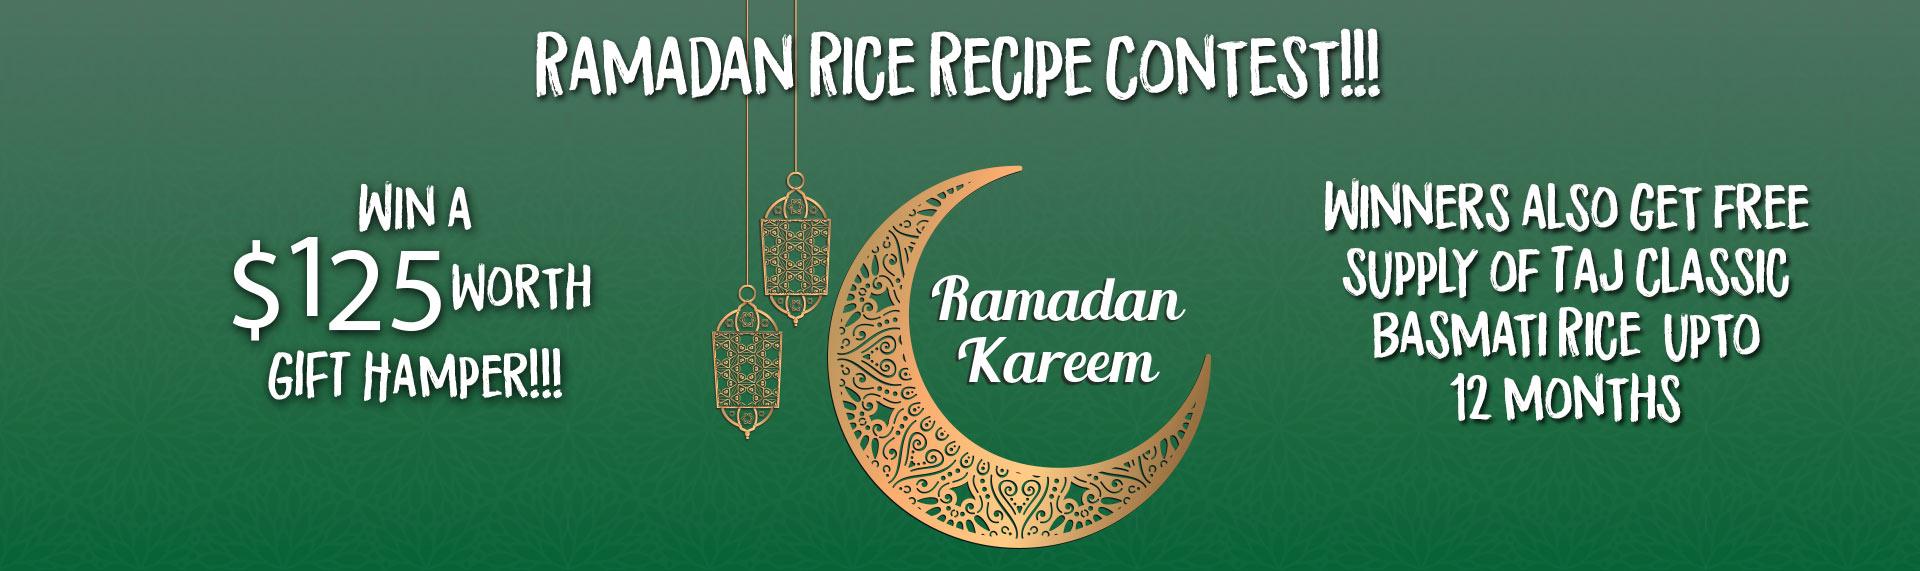 Ramadan Rice Contest Banner